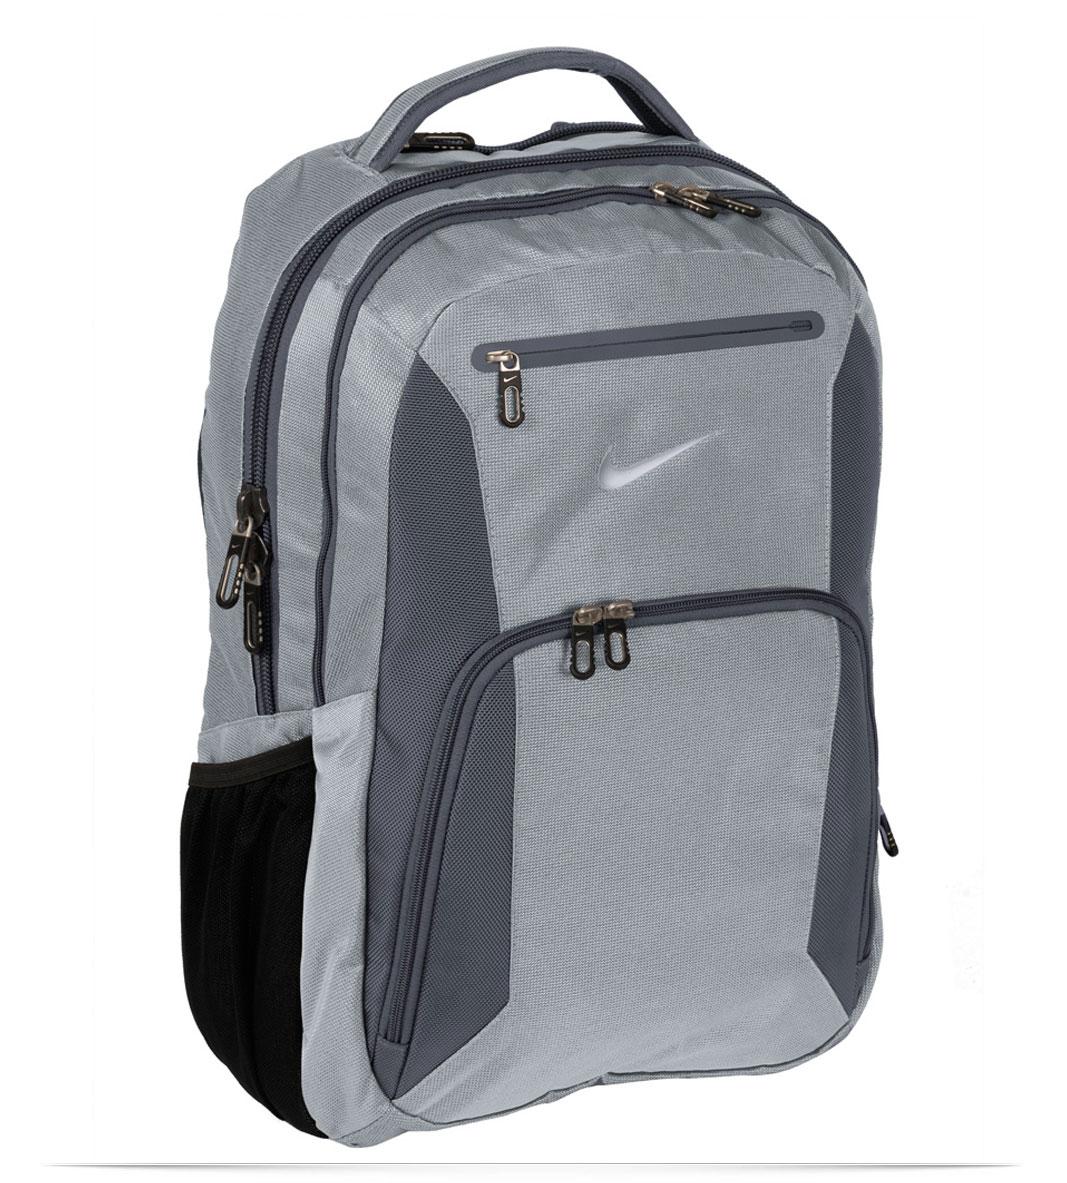 Black And Gold Nike Hoops Backpack- Fenix Toulouse Handball cc31381261930